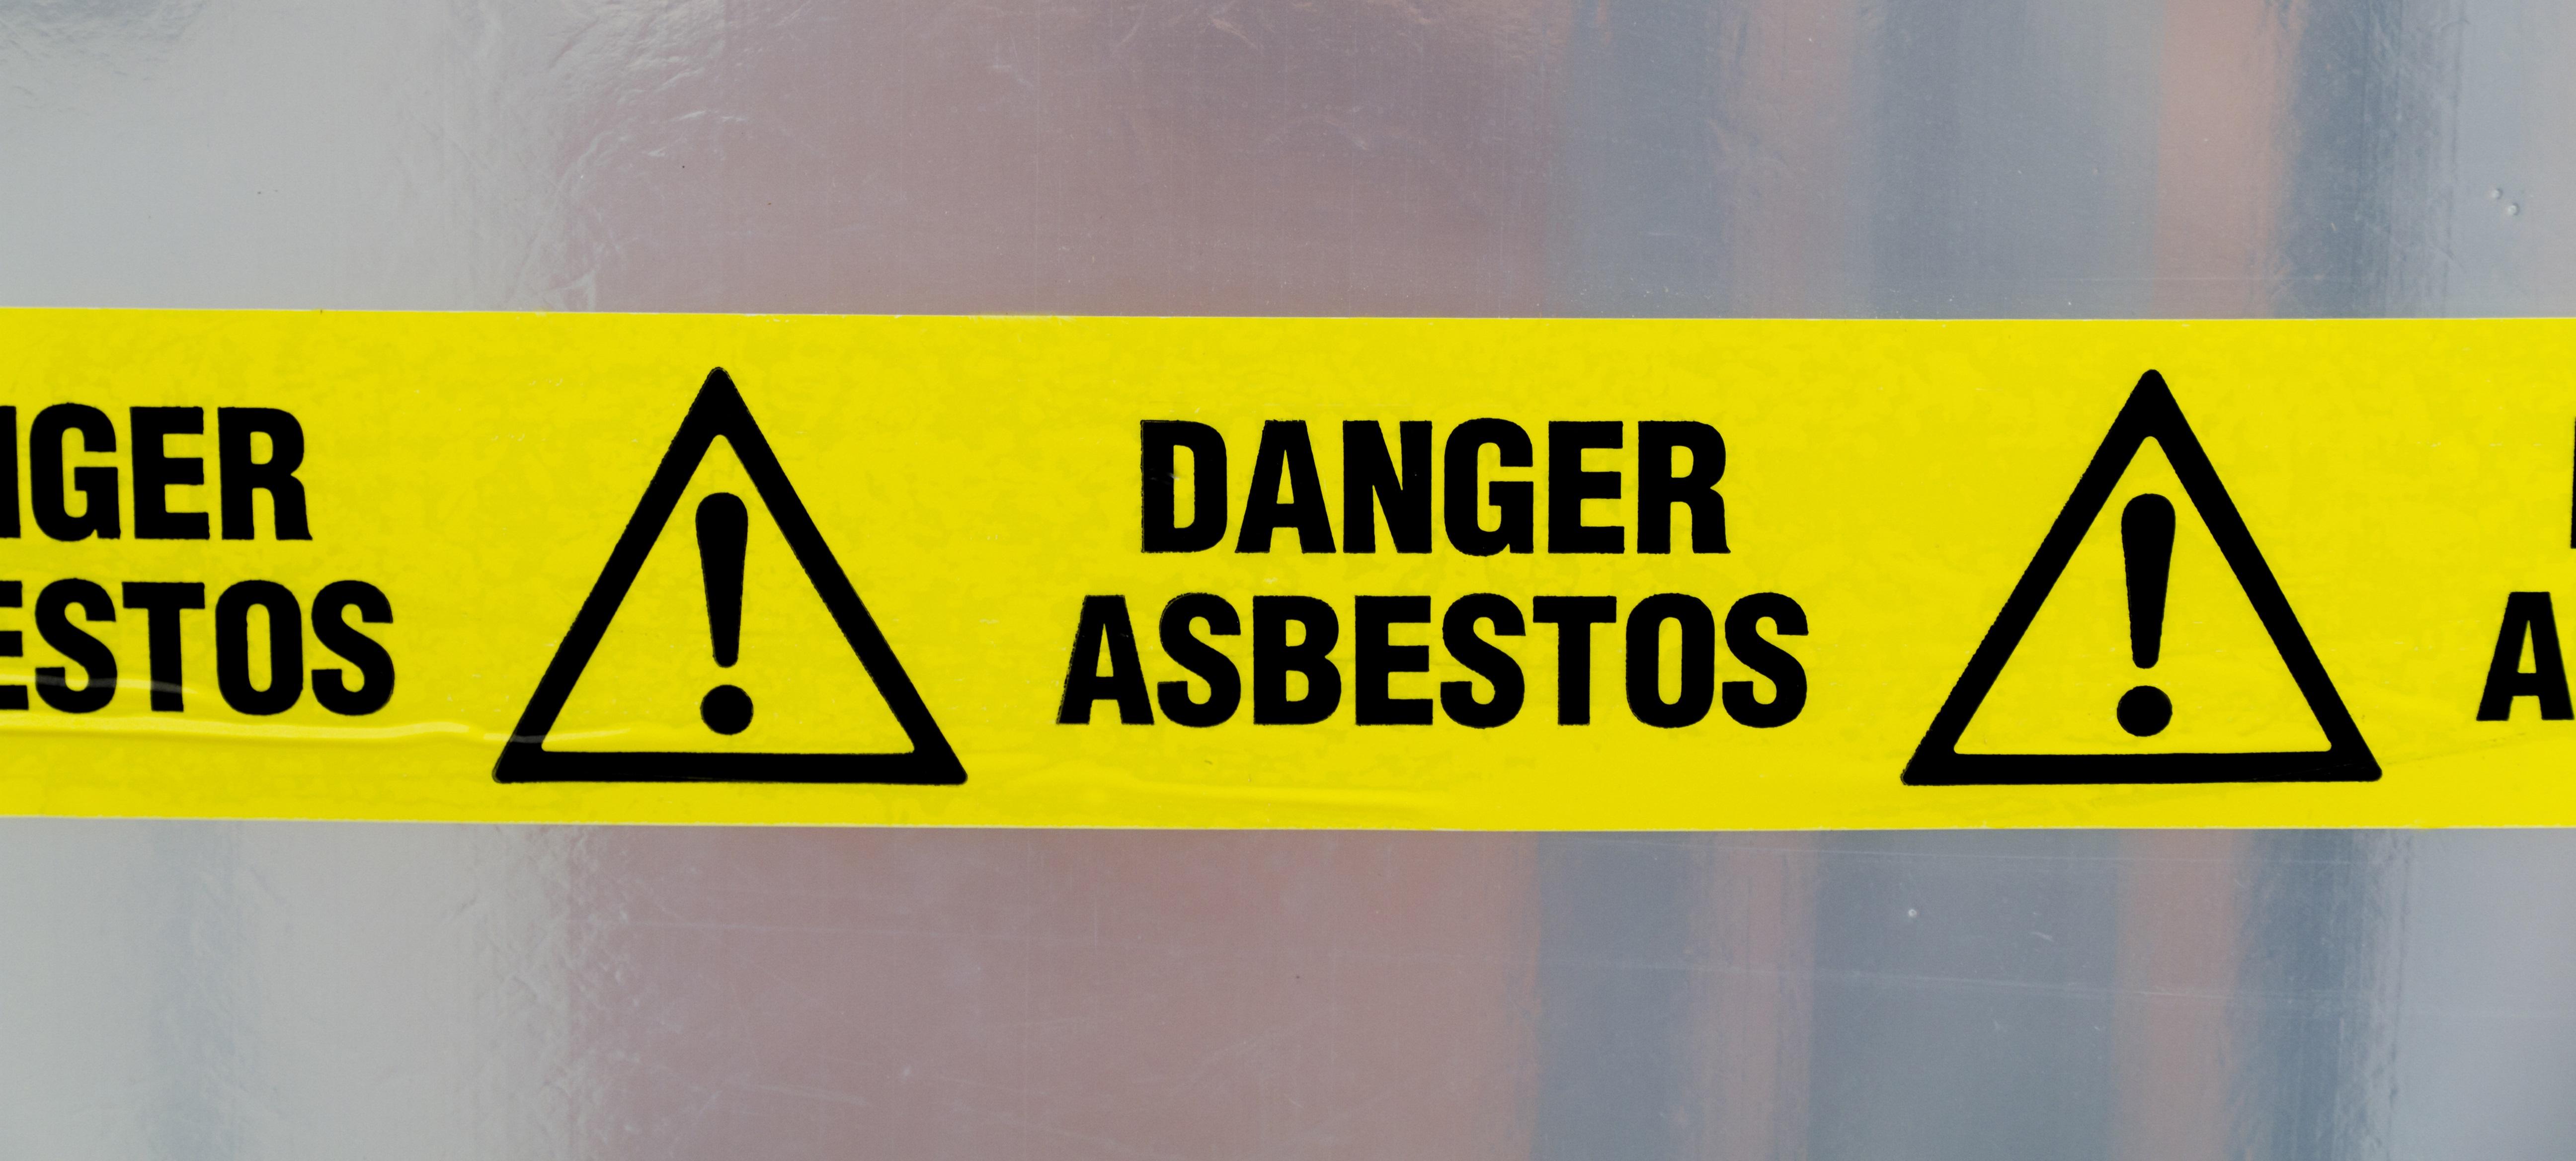 asbestos-image